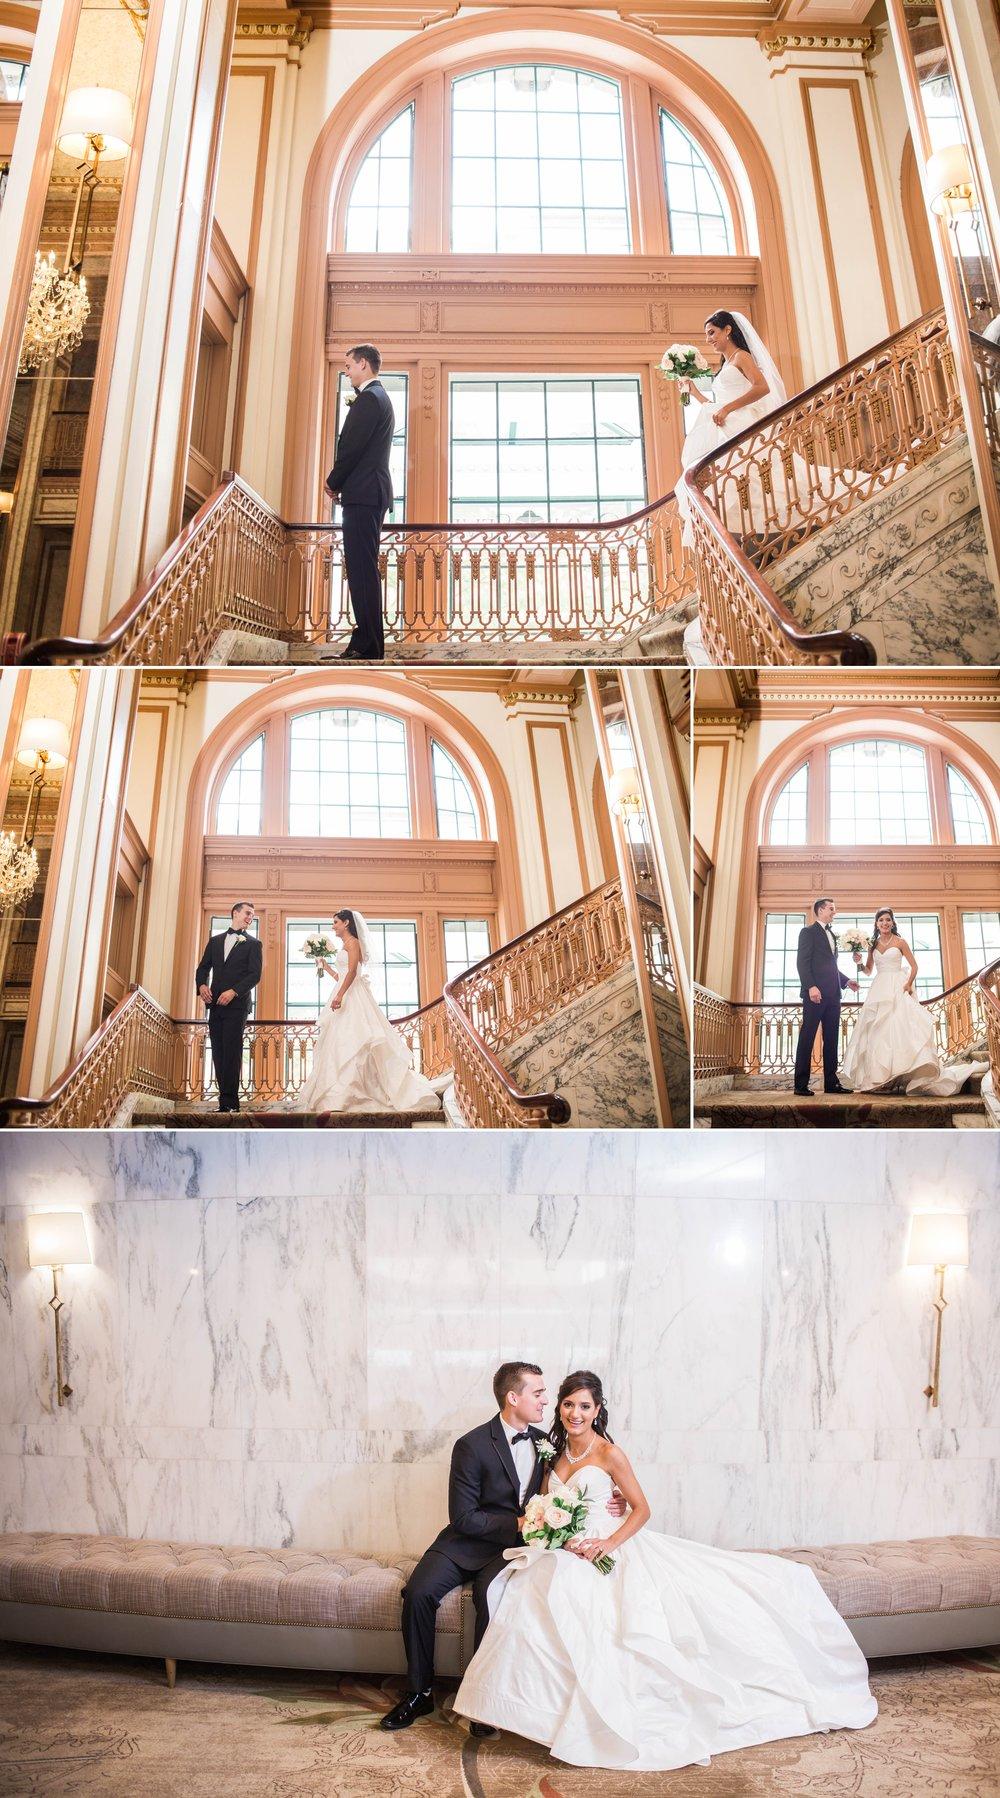 wedding-wedding day-bride-groom-first look-indianapolis-the omni